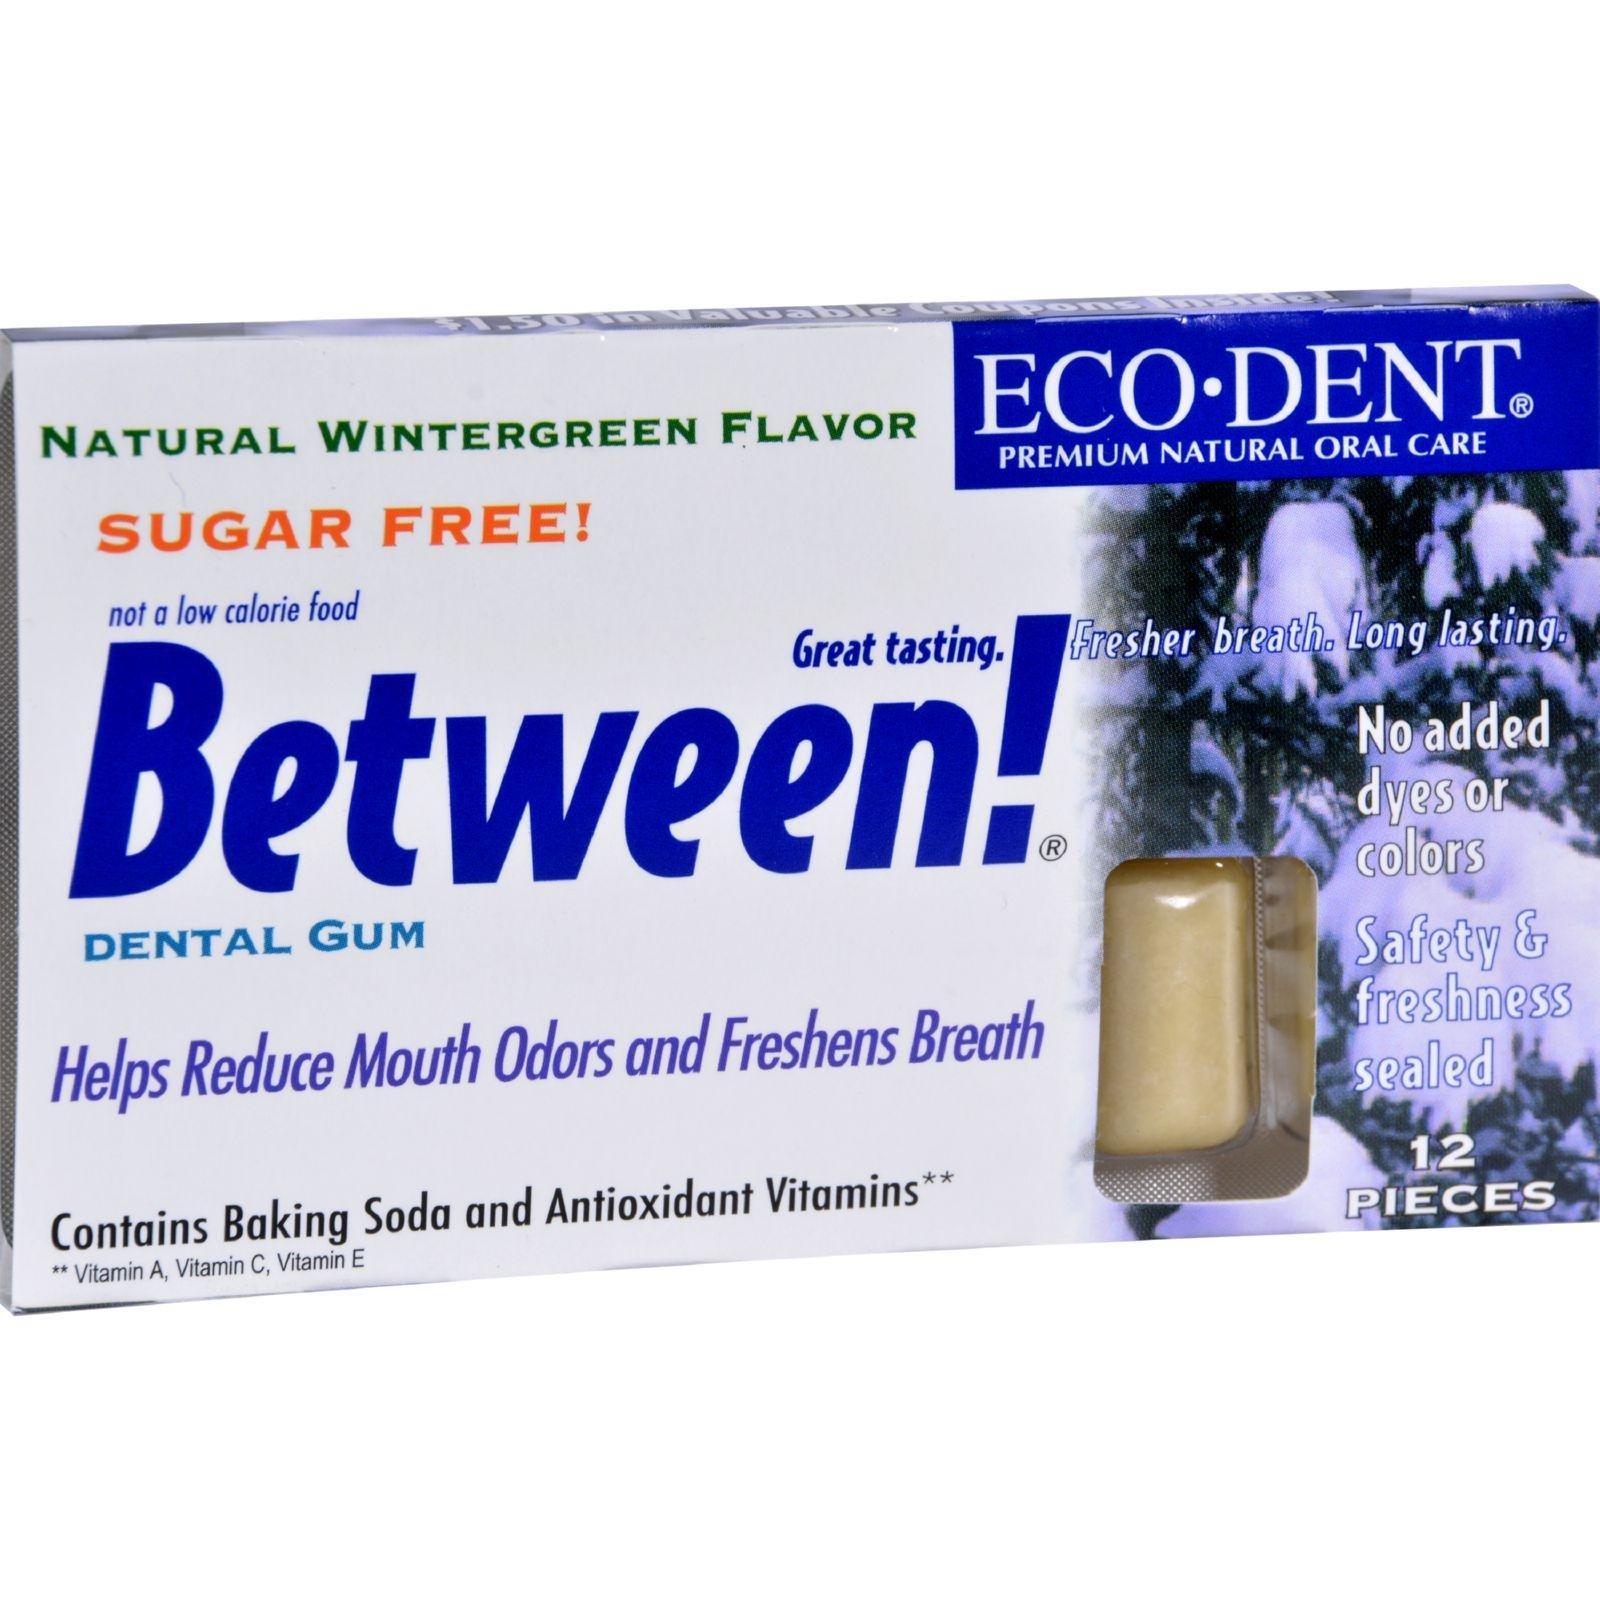 Eco-Dent Wintergreen Between Dental Gum ( 12x12 Pc)